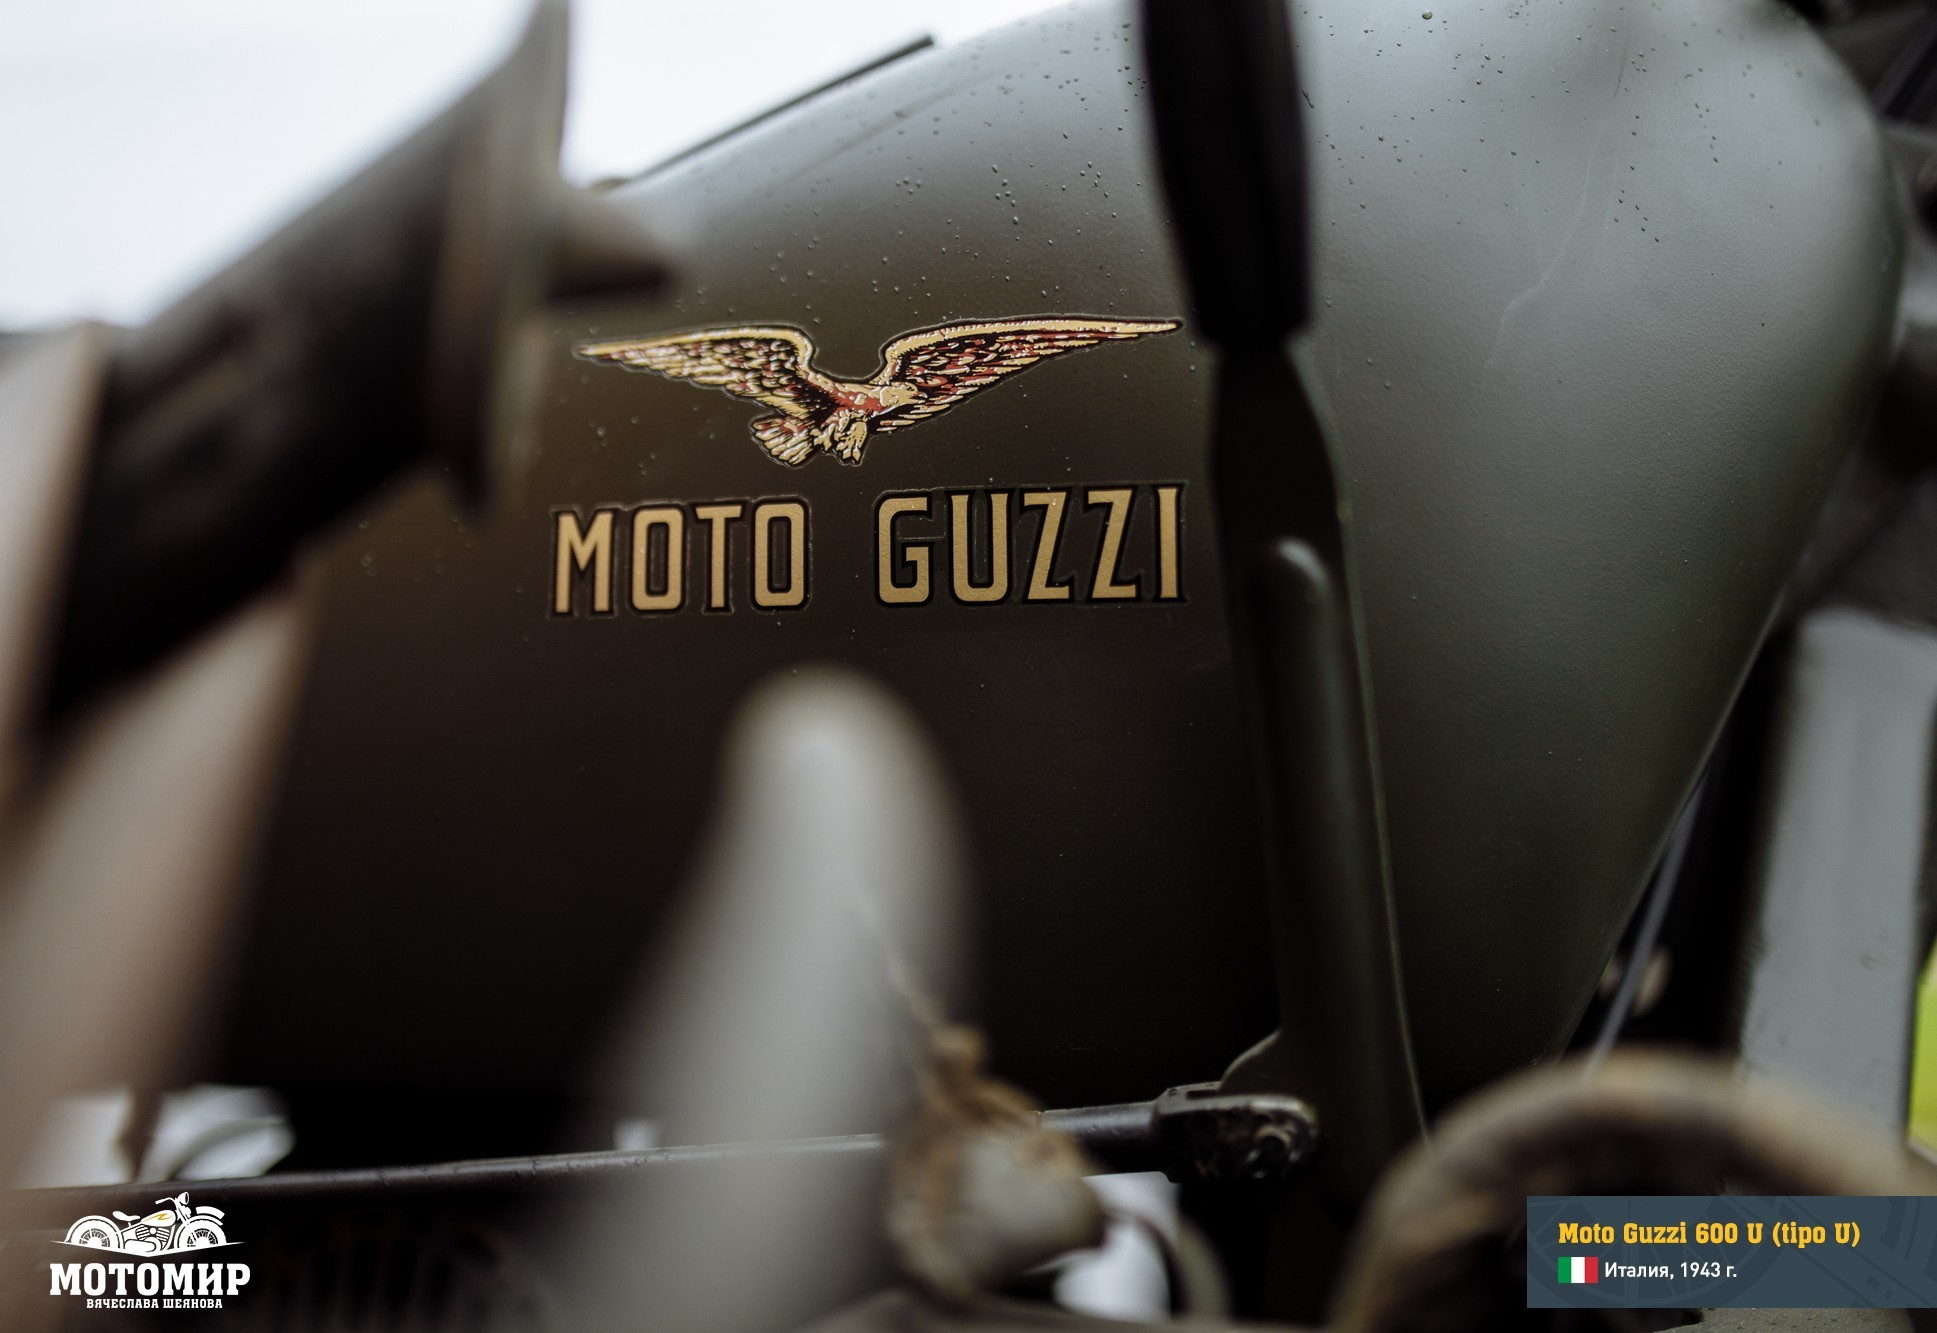 moto-guzzi-600-u-web-44